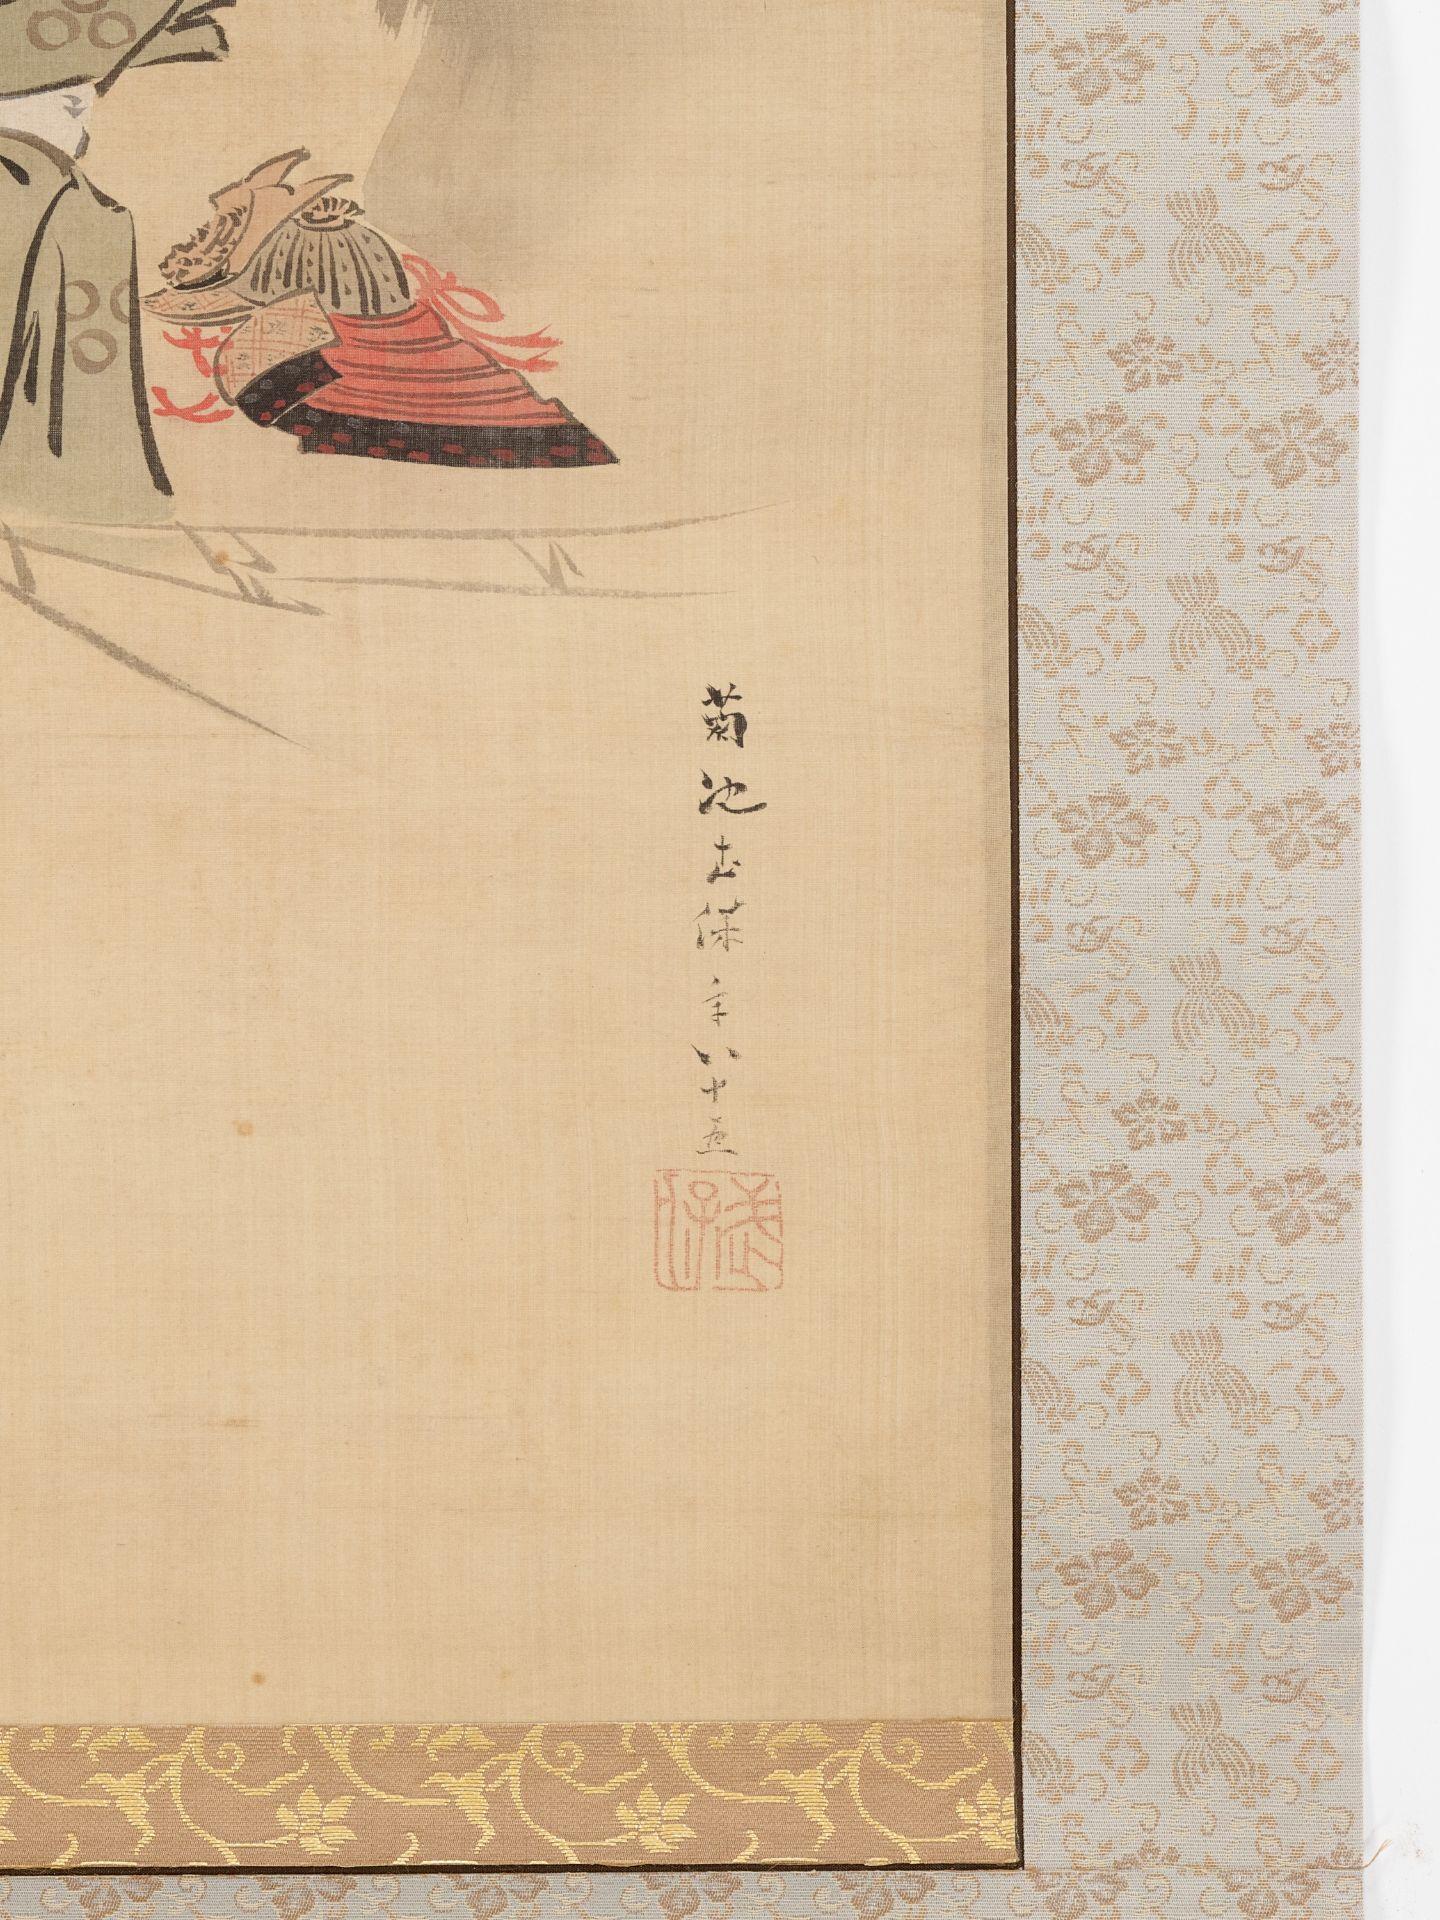 KIKUCHI YOSAI: A SCROLL PAINTING OF TWO SAMURAI IN THE MOUNTAINS - Image 4 of 5